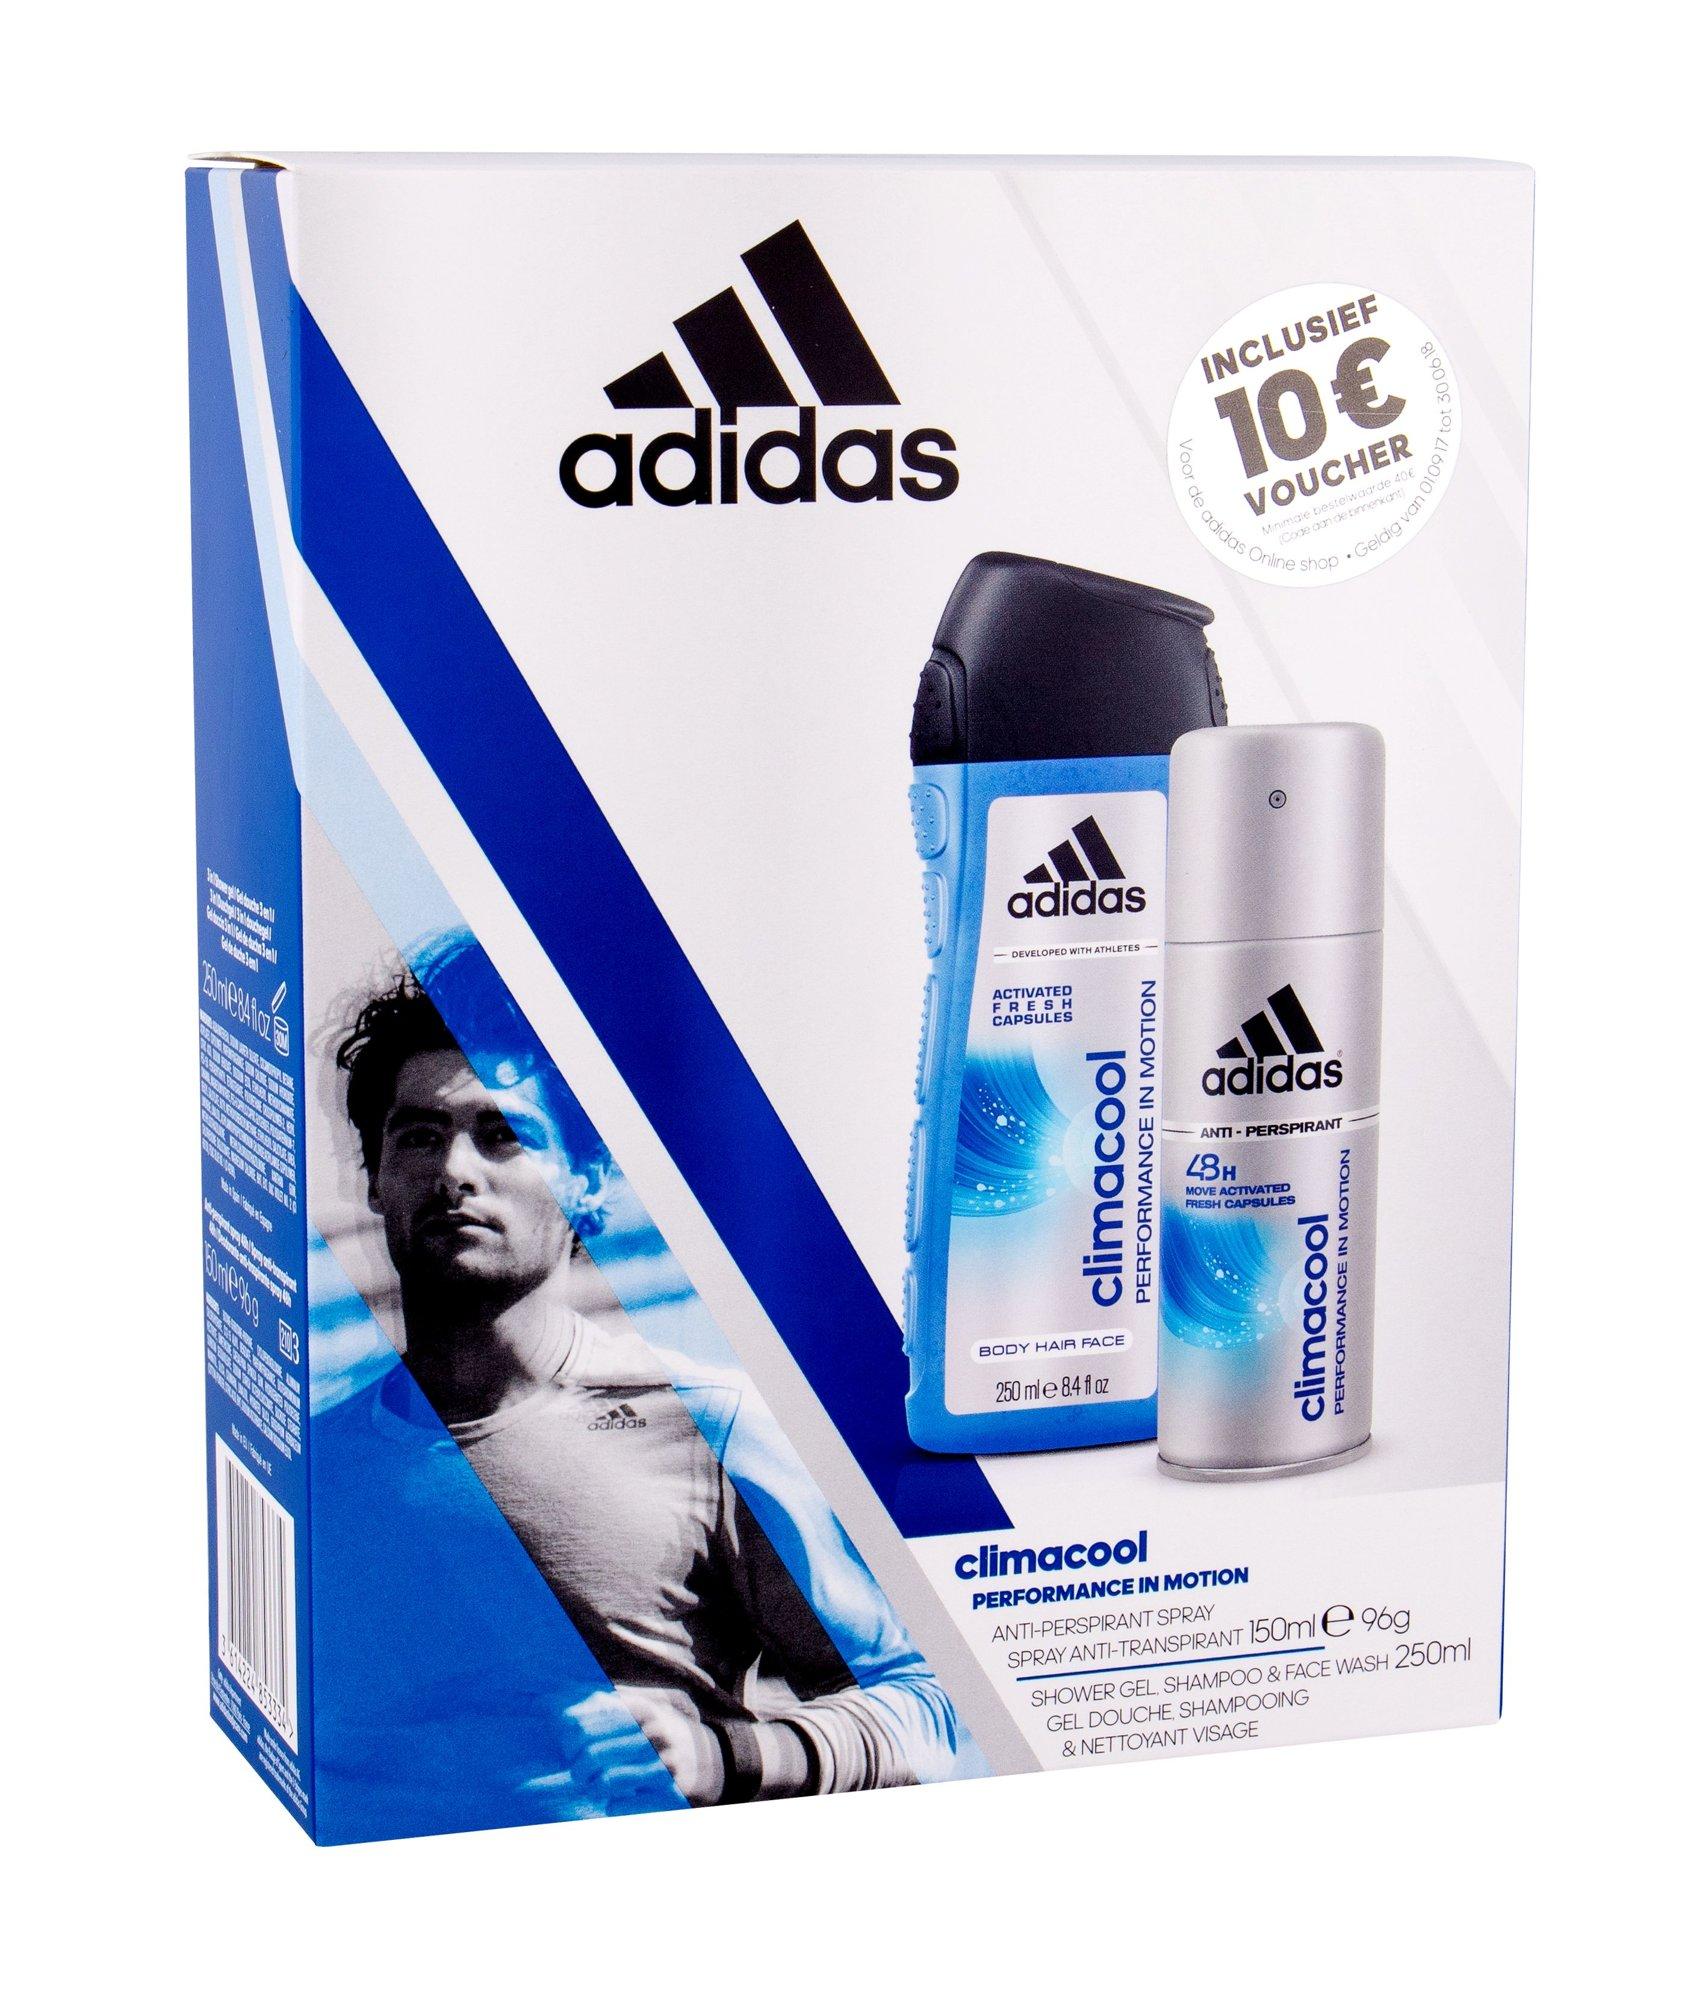 Adidas Climacool Antiperspirant 150ml